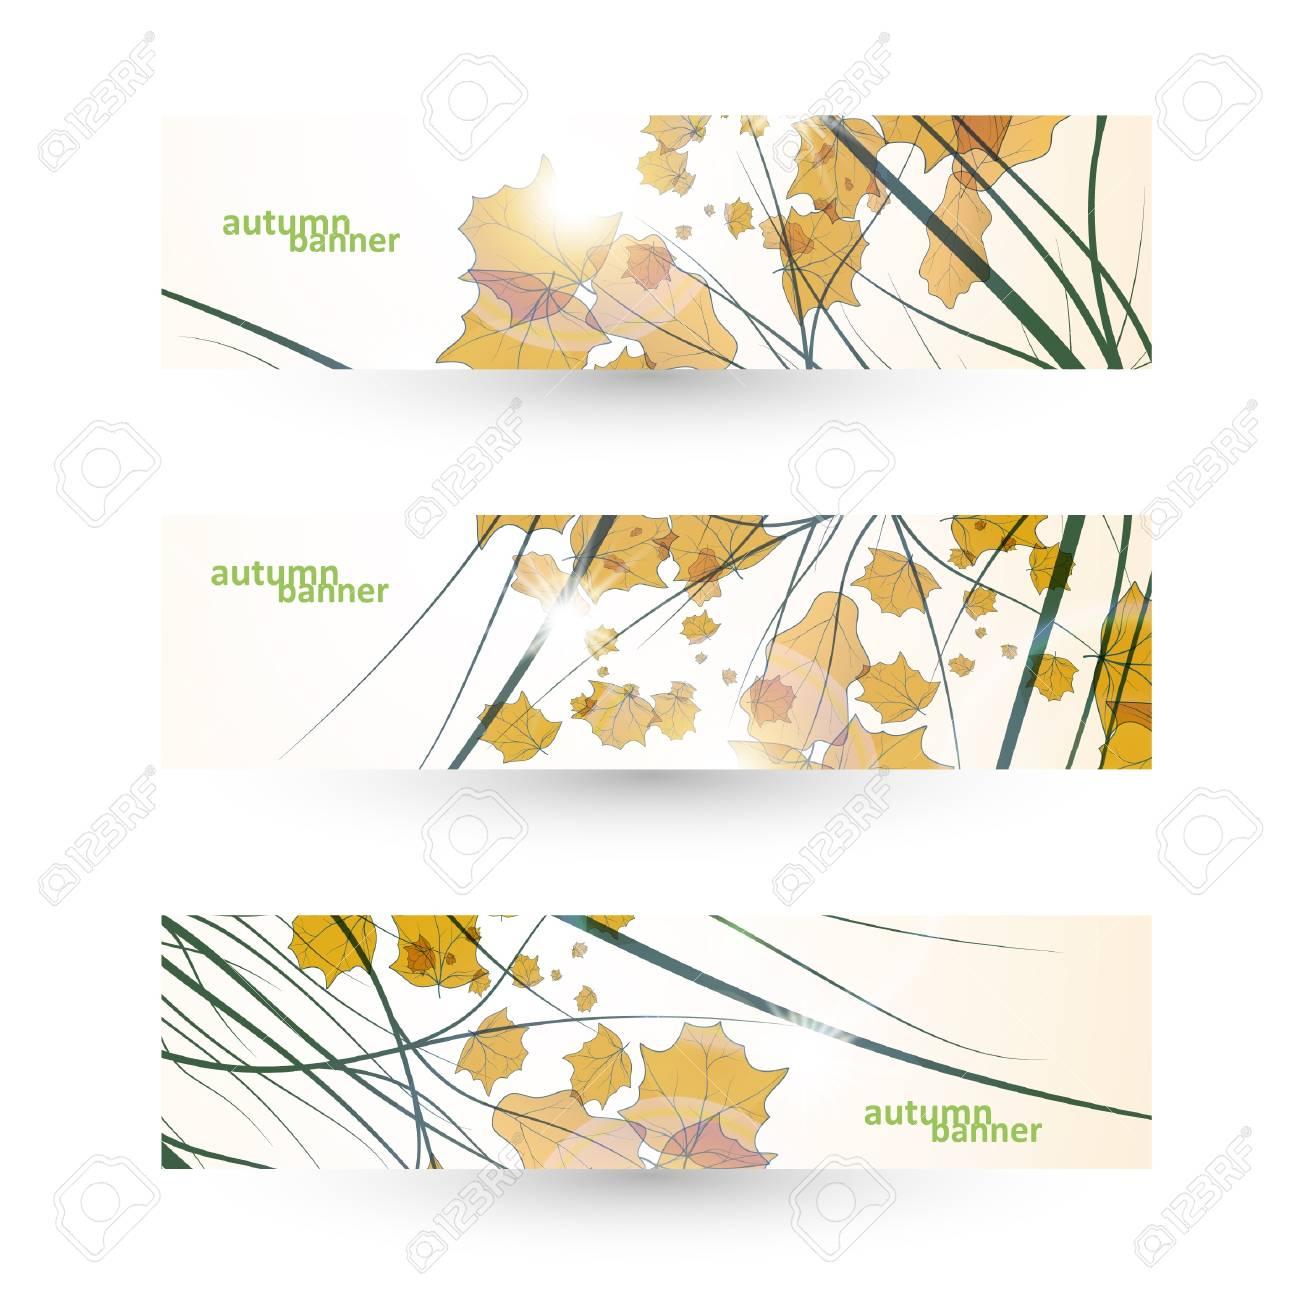 Autumn banner set, vector illustration eps10 Stock Vector - 15192254